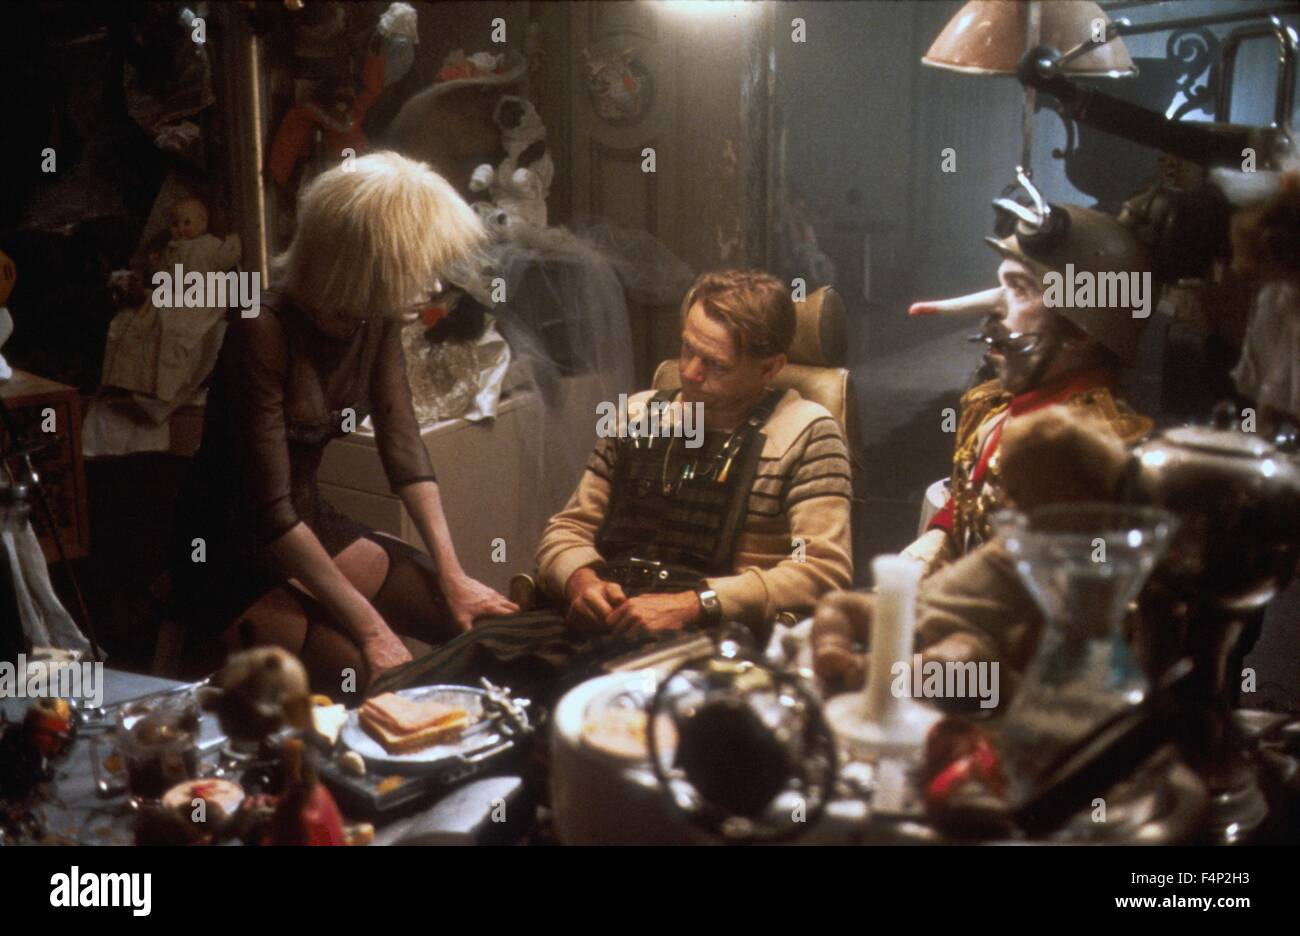 William Sanderson, Daryl Hannah / Blade Runner 1982 directed by Ridley Scott - Stock Image